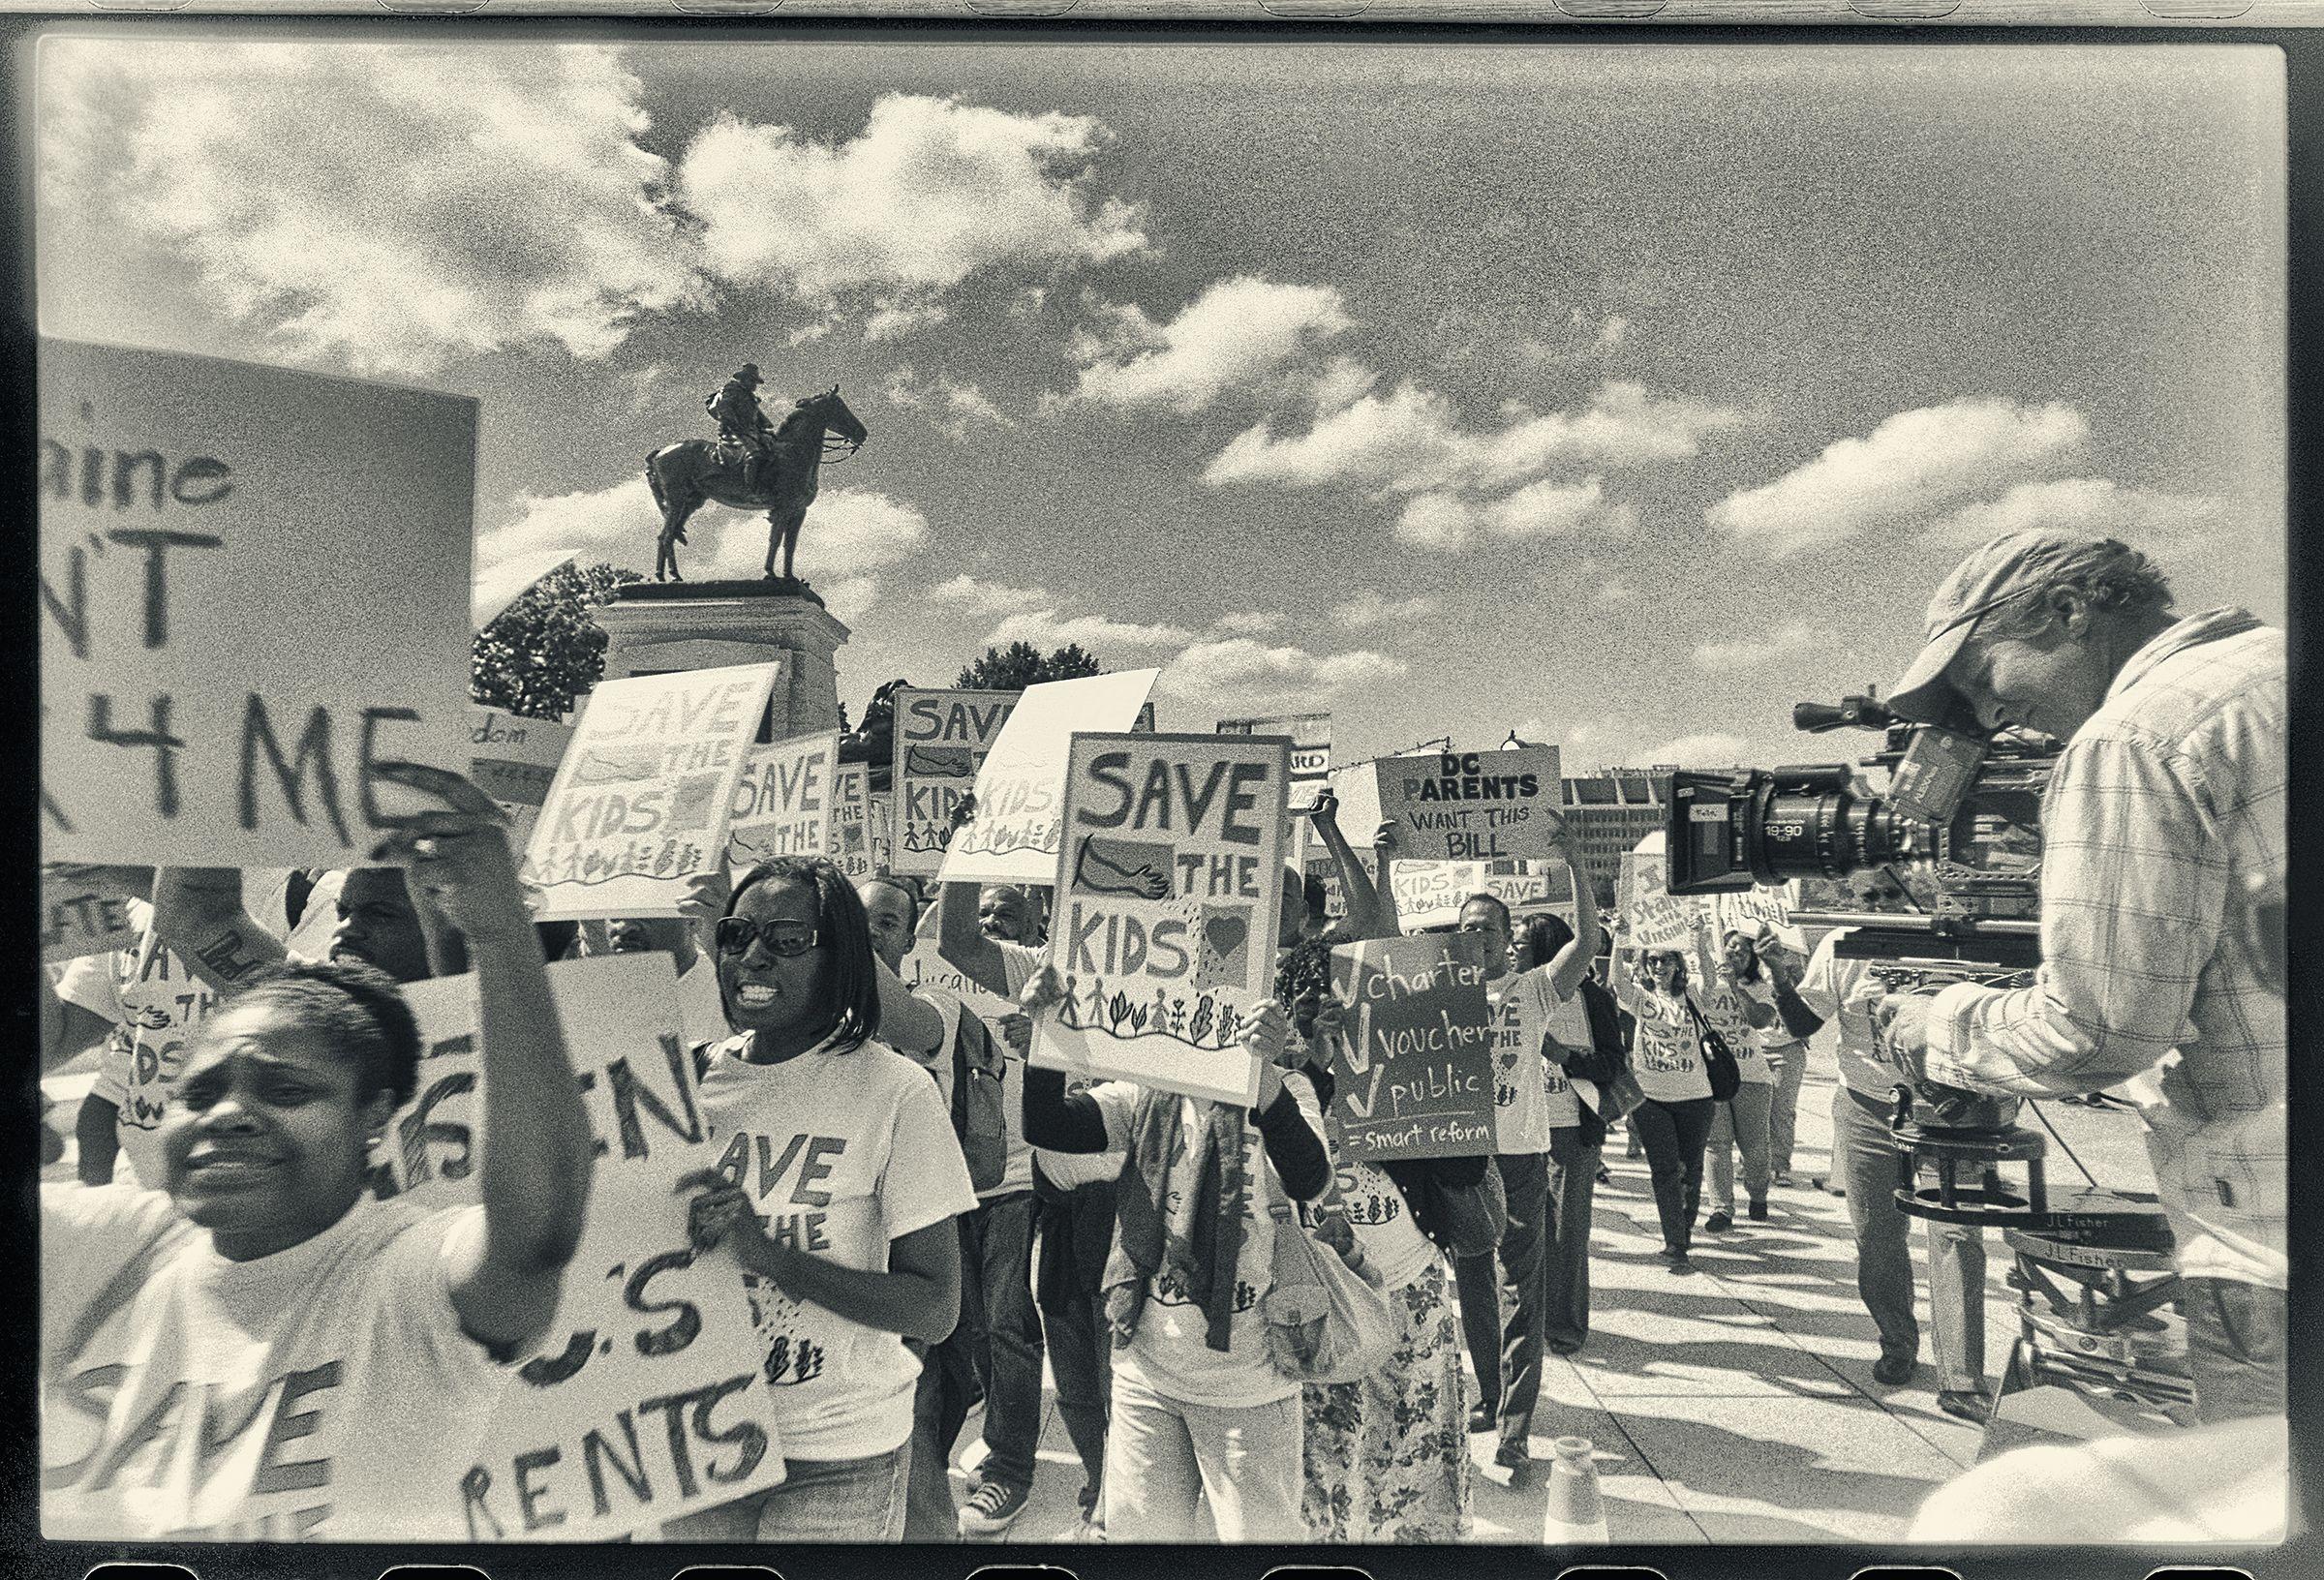 Movie Set In Washington Dc Protest Maryland Film Photographer Film Photographers Movie Sets Still Photography